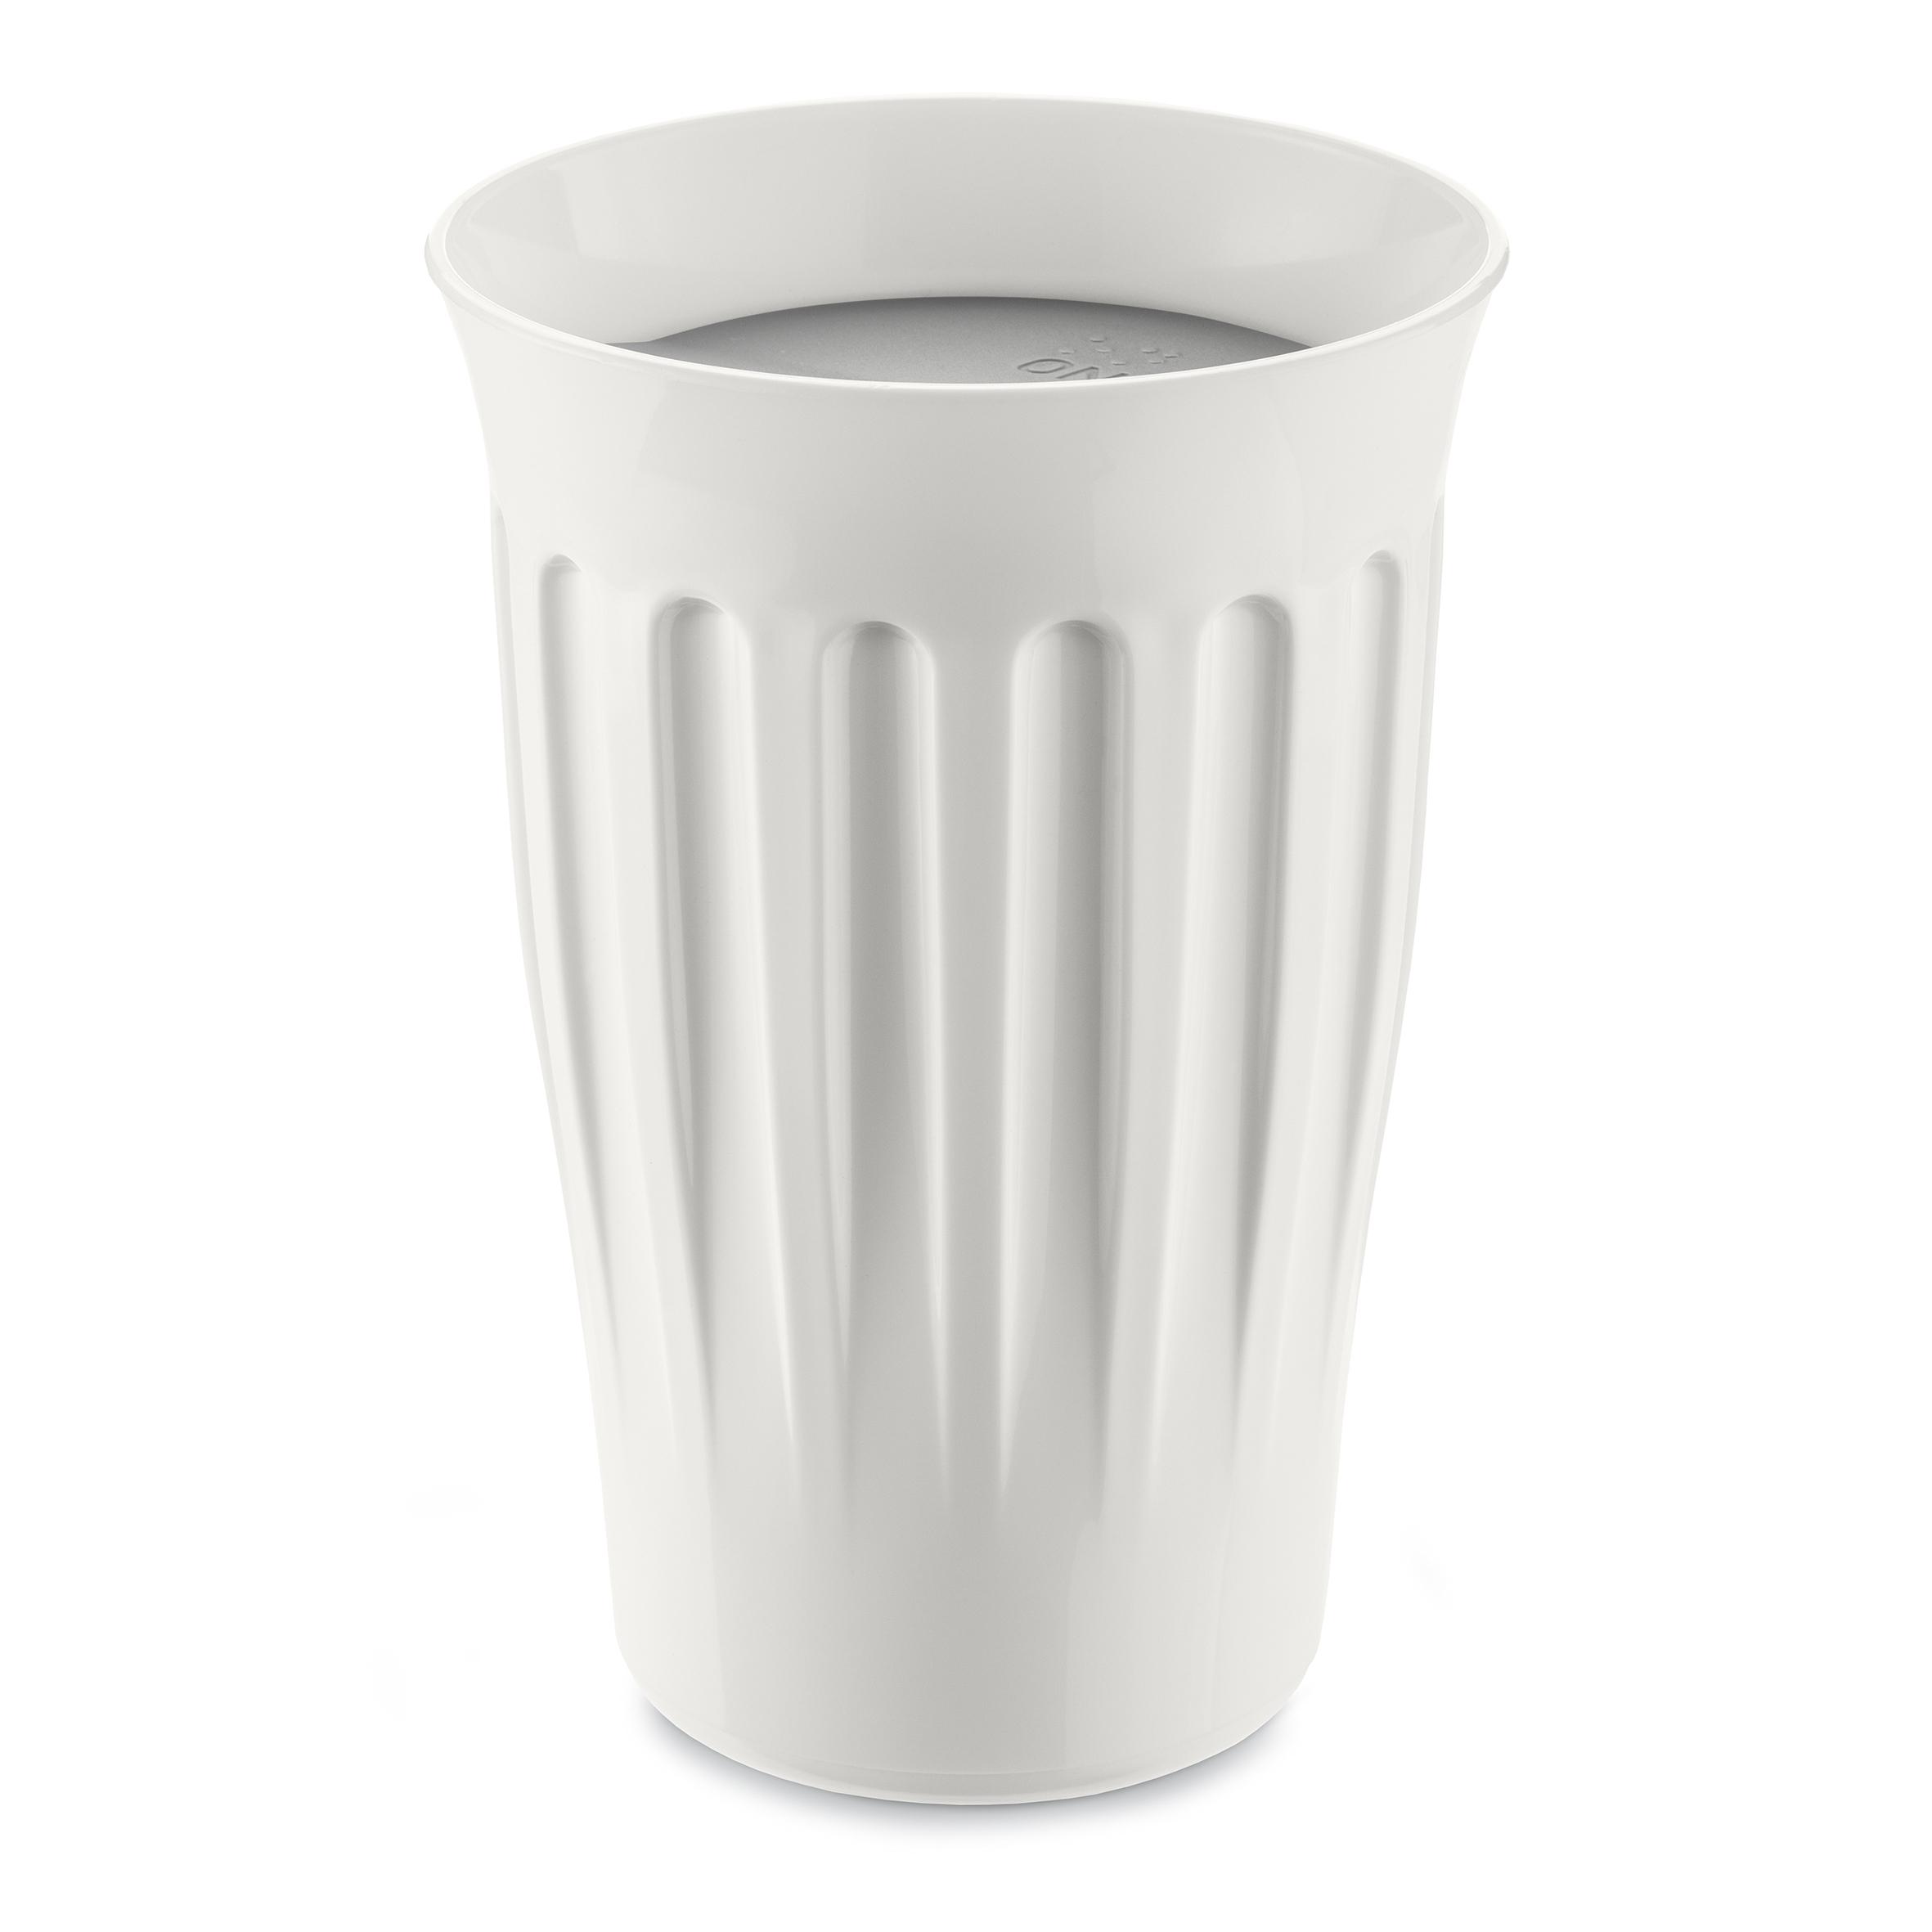 Pahar cu capac, din termoplastic Click To – Go Alb / Gri, 350 ml, Ø9,3xH13,6 cm